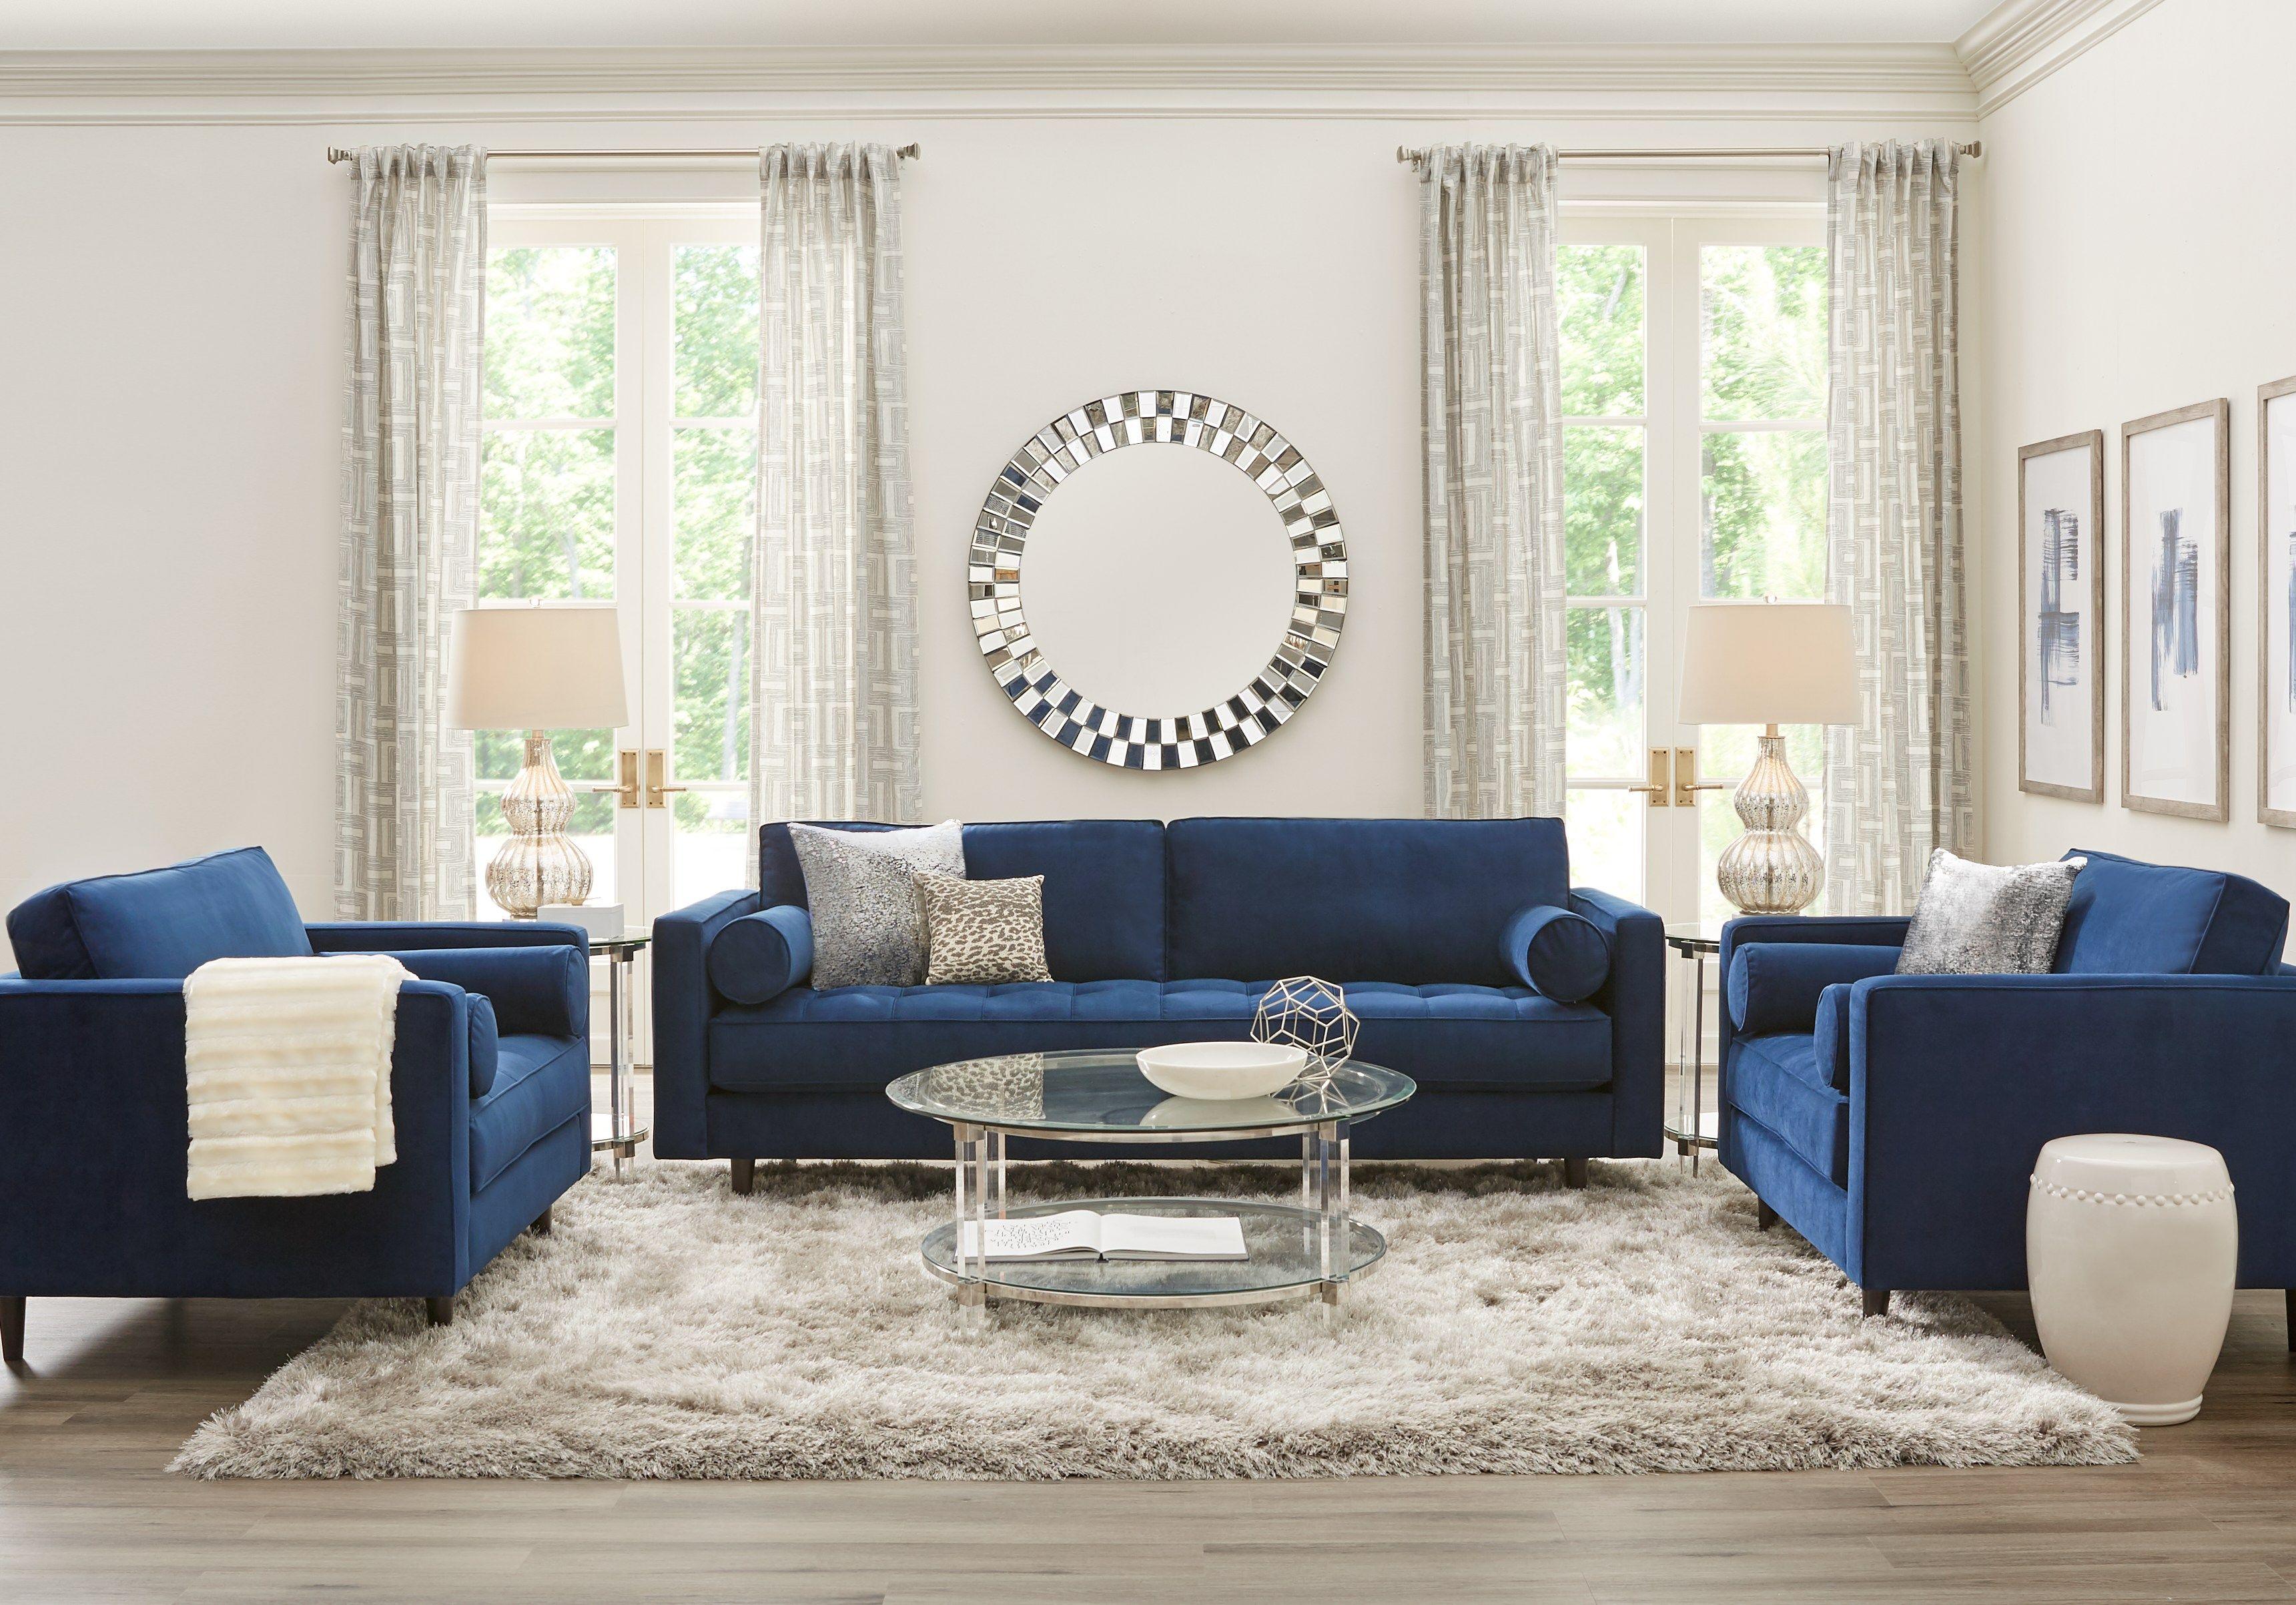 Sofia Vergara Pacific Palisades Navy Plush 5 Pc Living Room ...